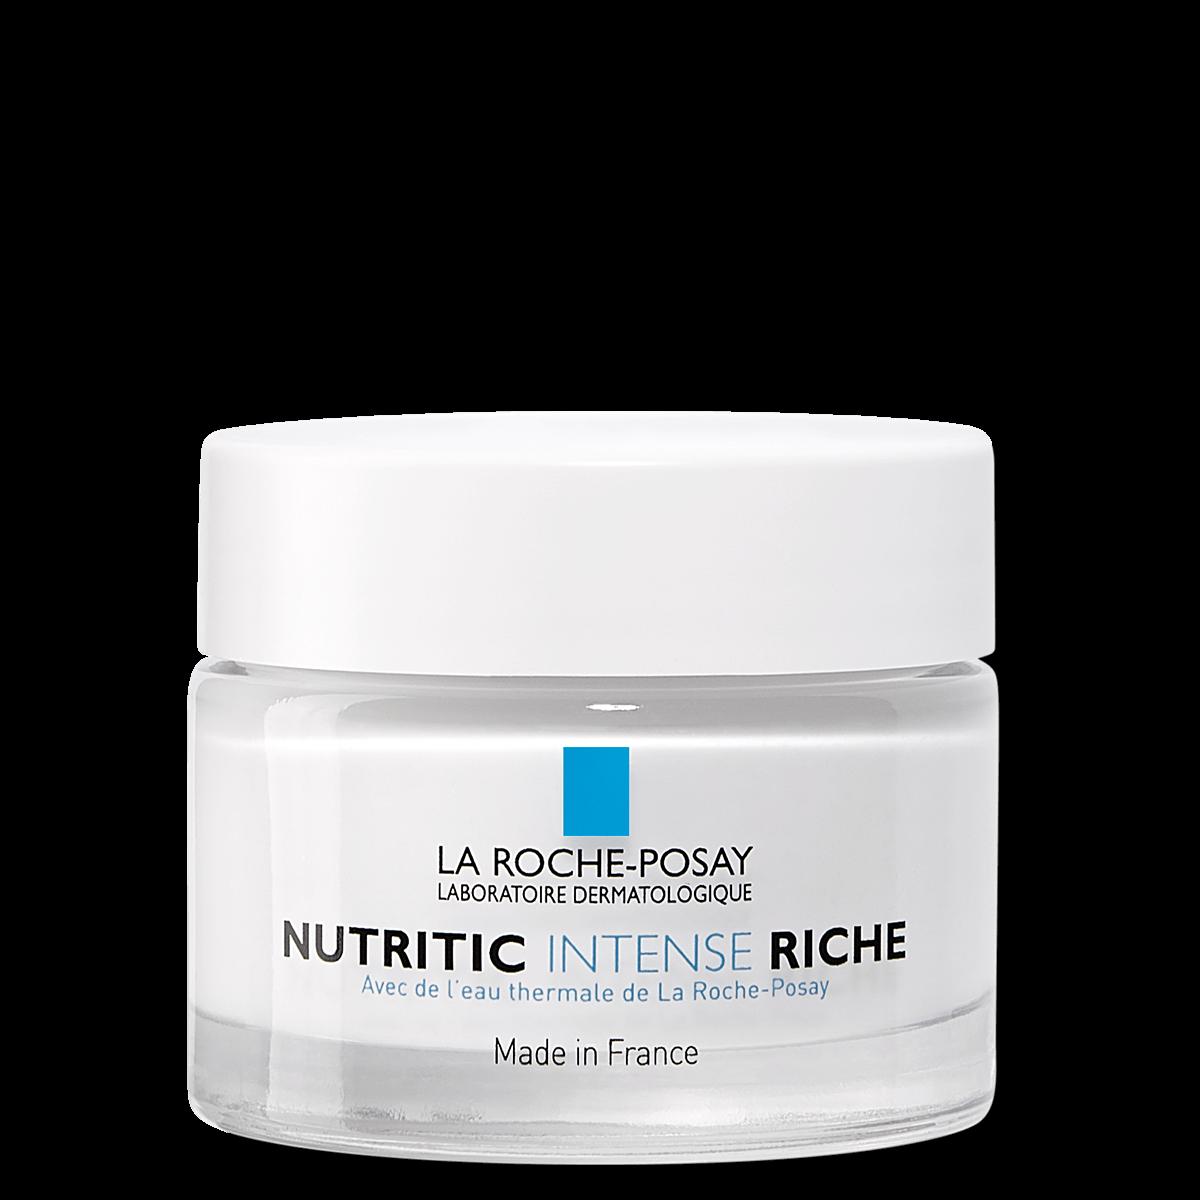 Krem odżywczy NUTRITIC INTENSE RICHE 50 ml Przód | La Roche Posay